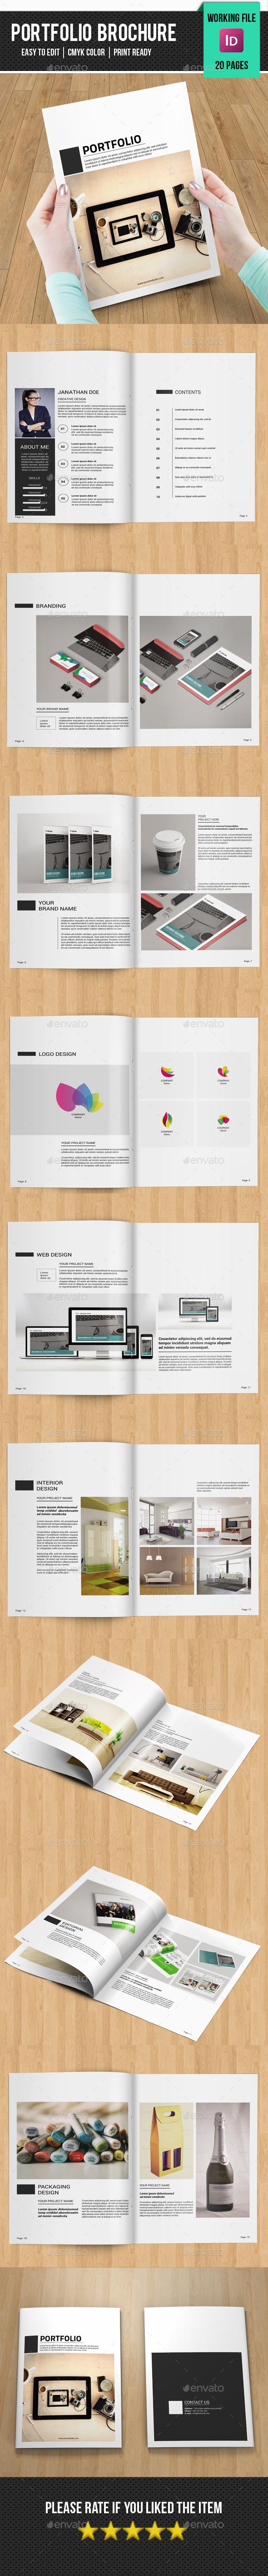 Minimal Portfolio Brochure-V326 - Portfolio Brochures